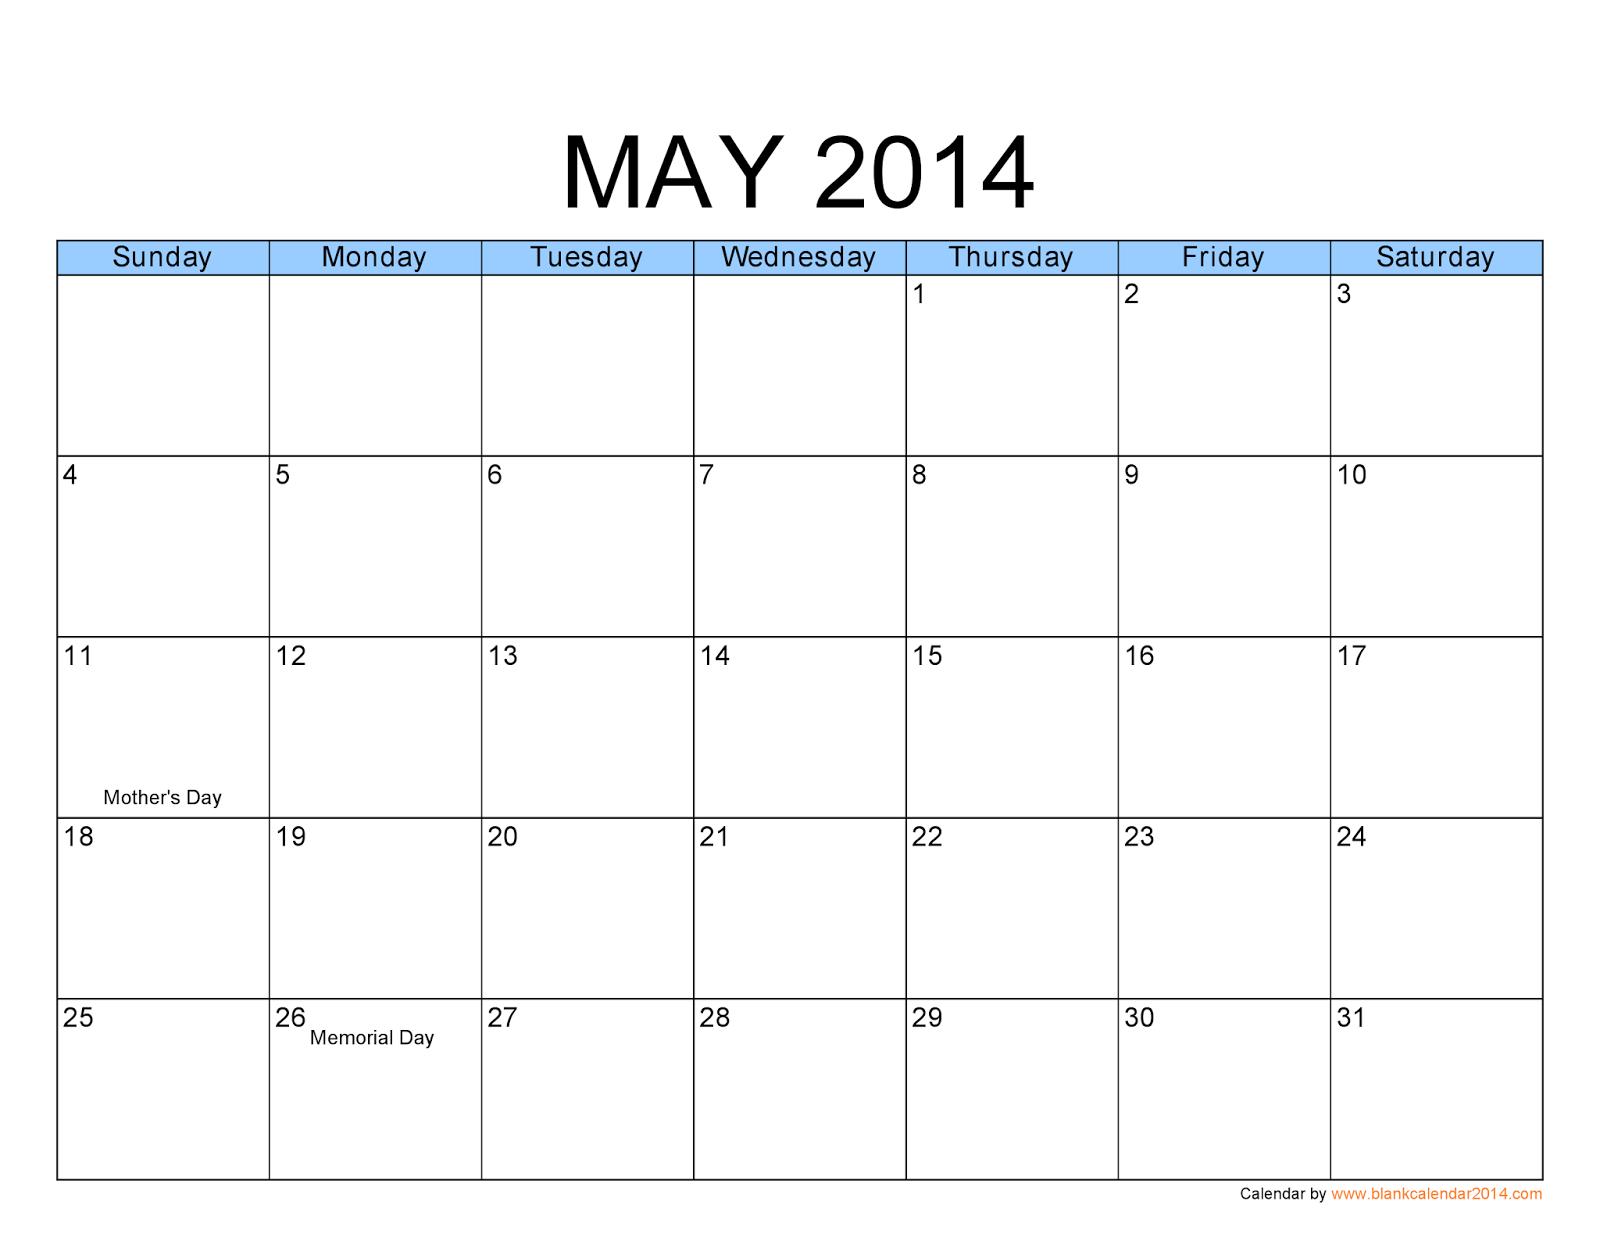 Calendar Website Template : Free may calendar new template site